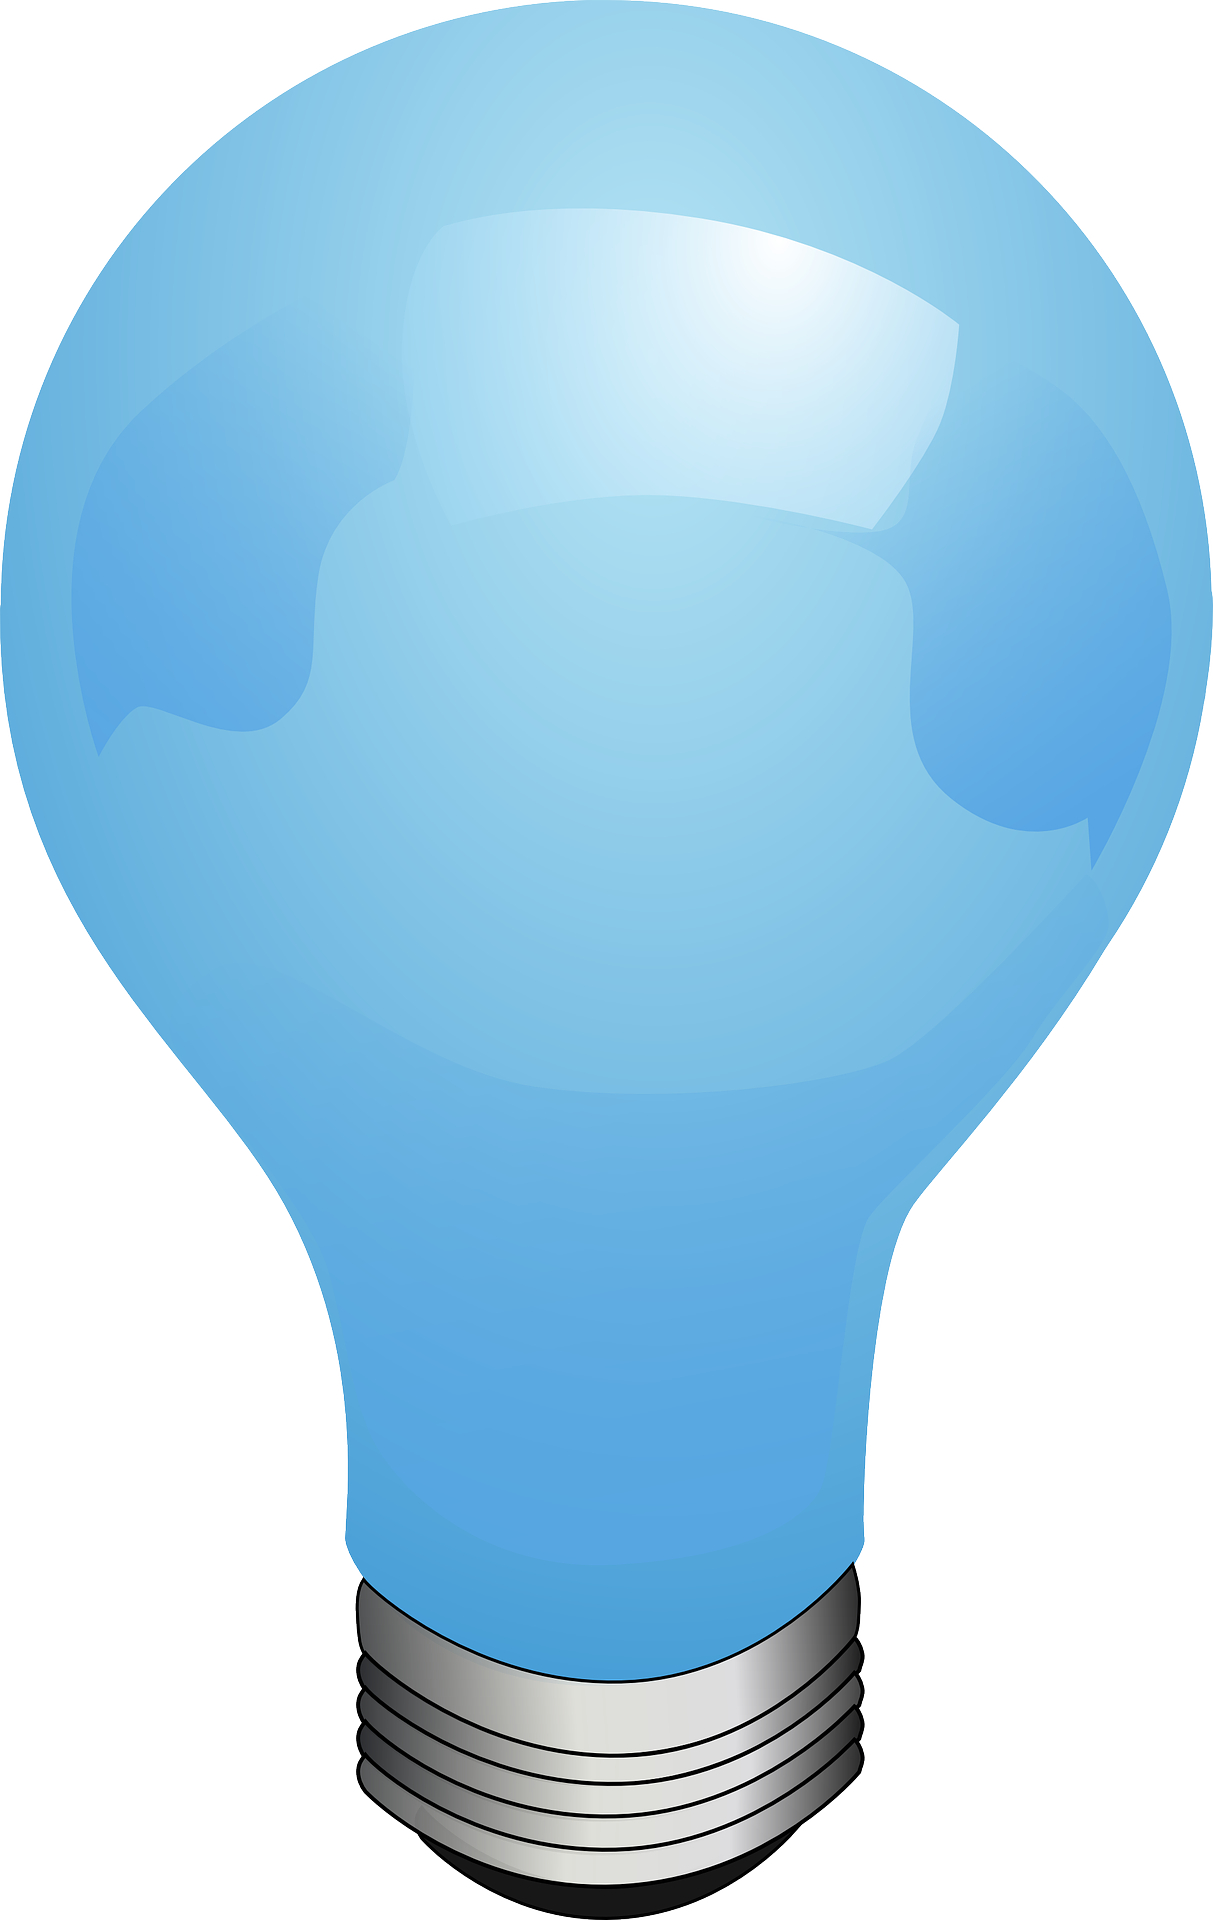 Blue electric light bulb vector